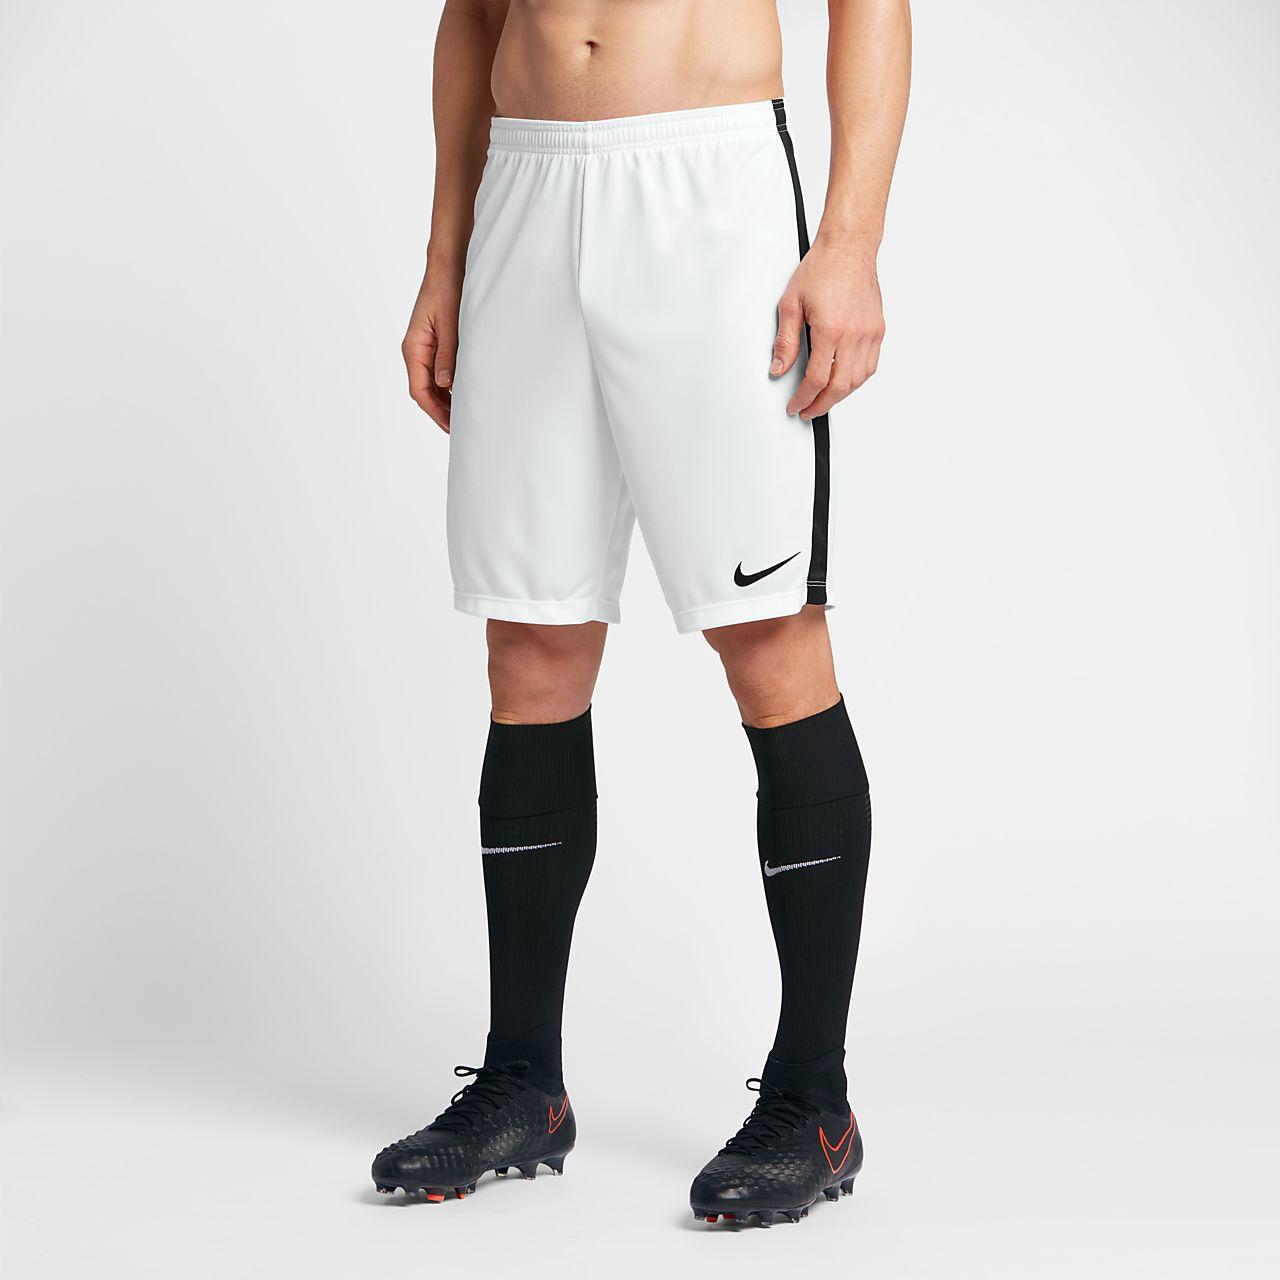 nike dri fit academy men 39 s football shorts ae. Black Bedroom Furniture Sets. Home Design Ideas